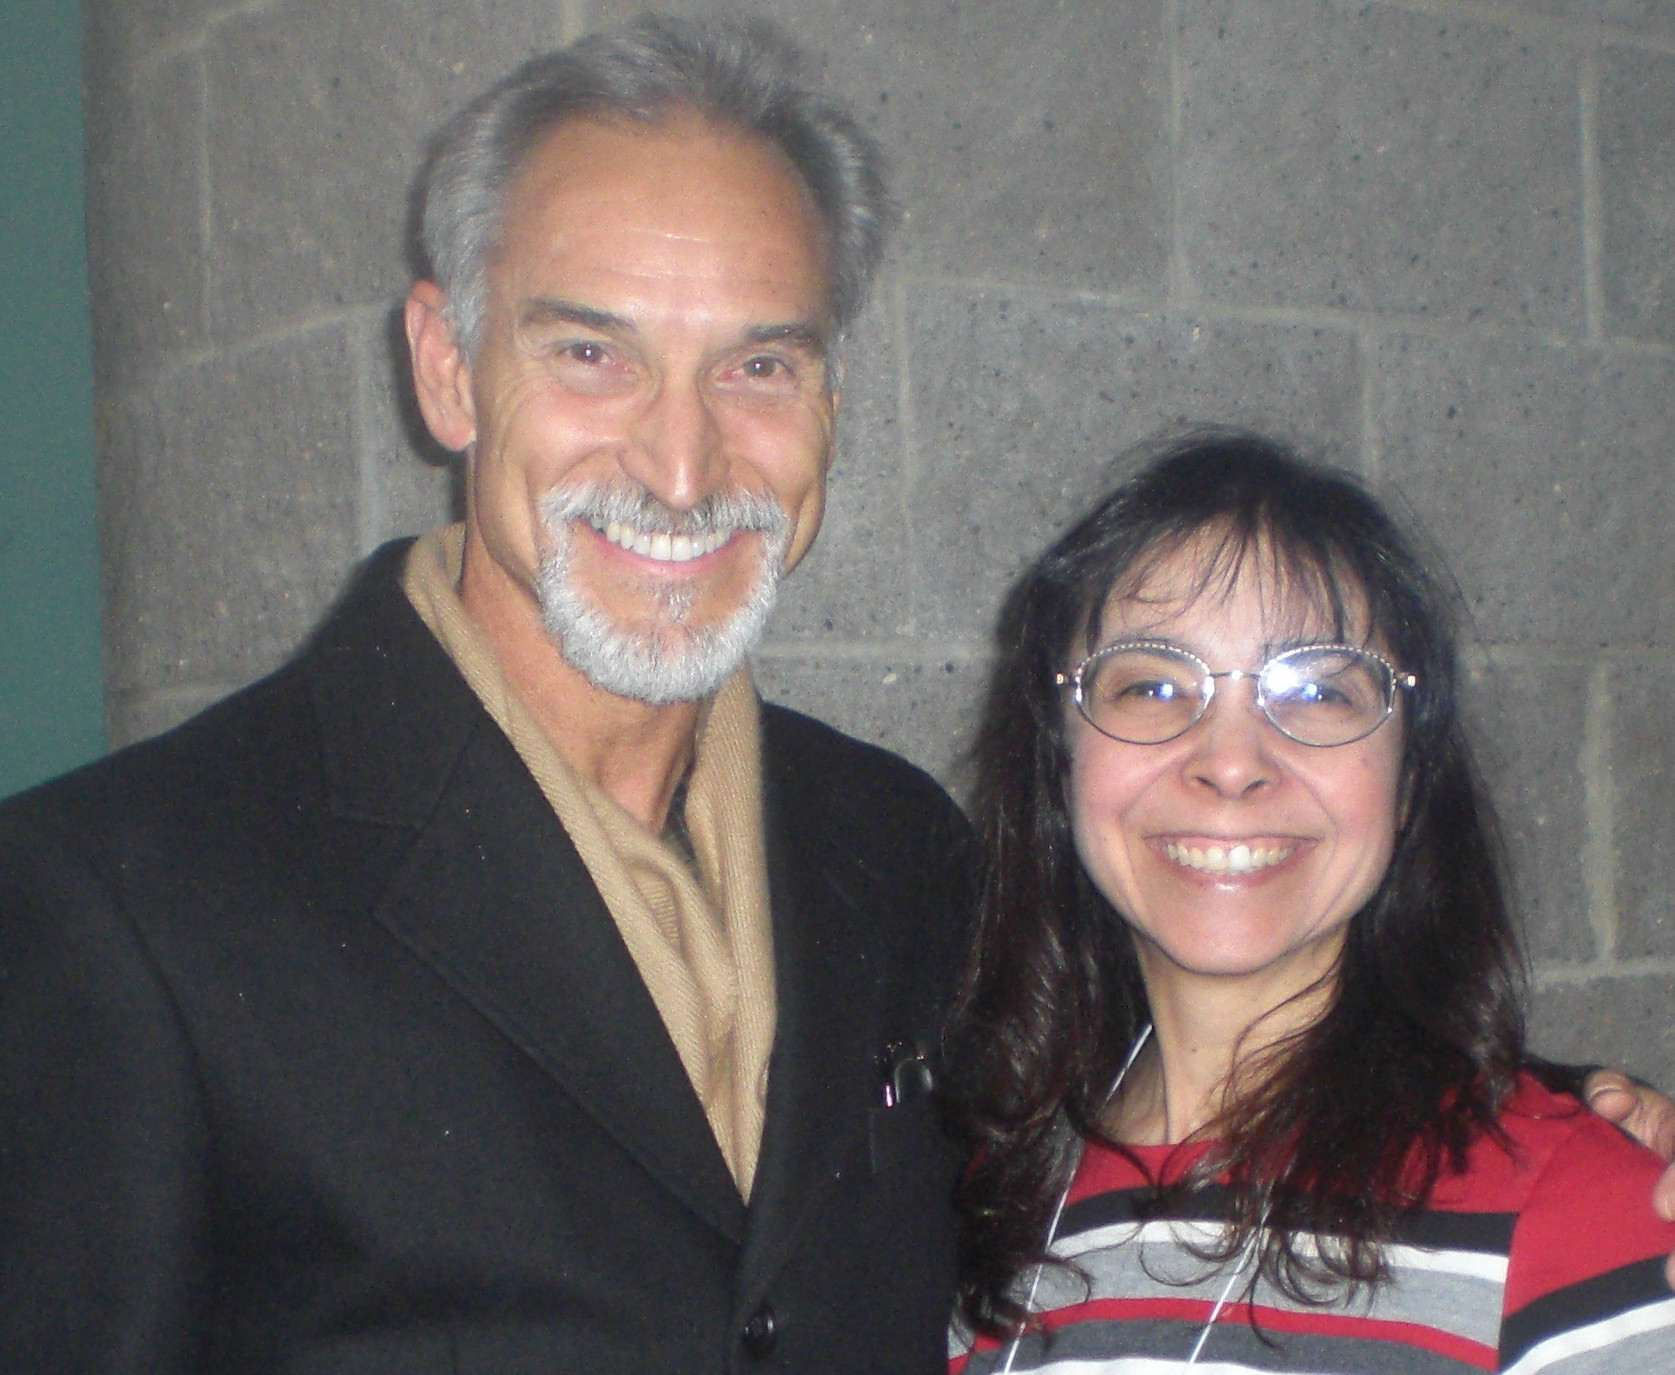 1976 U.S. Men's Figure Skating Champion Terry Kubicka With Jo Ann Schneider Farris